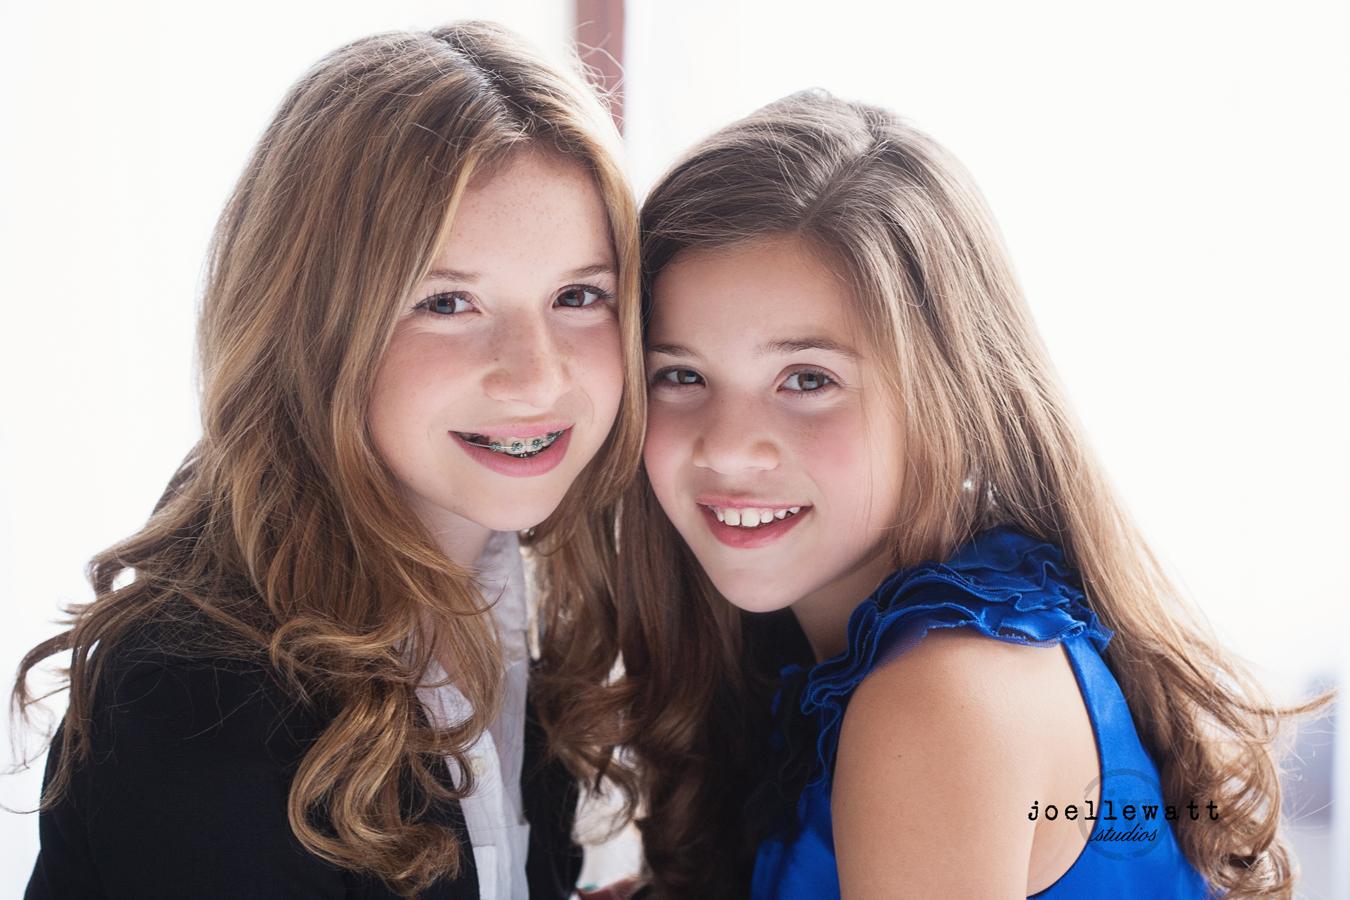 Zartman Girls2013 Joelle Watt Studios (49 of 159)blog.jpg